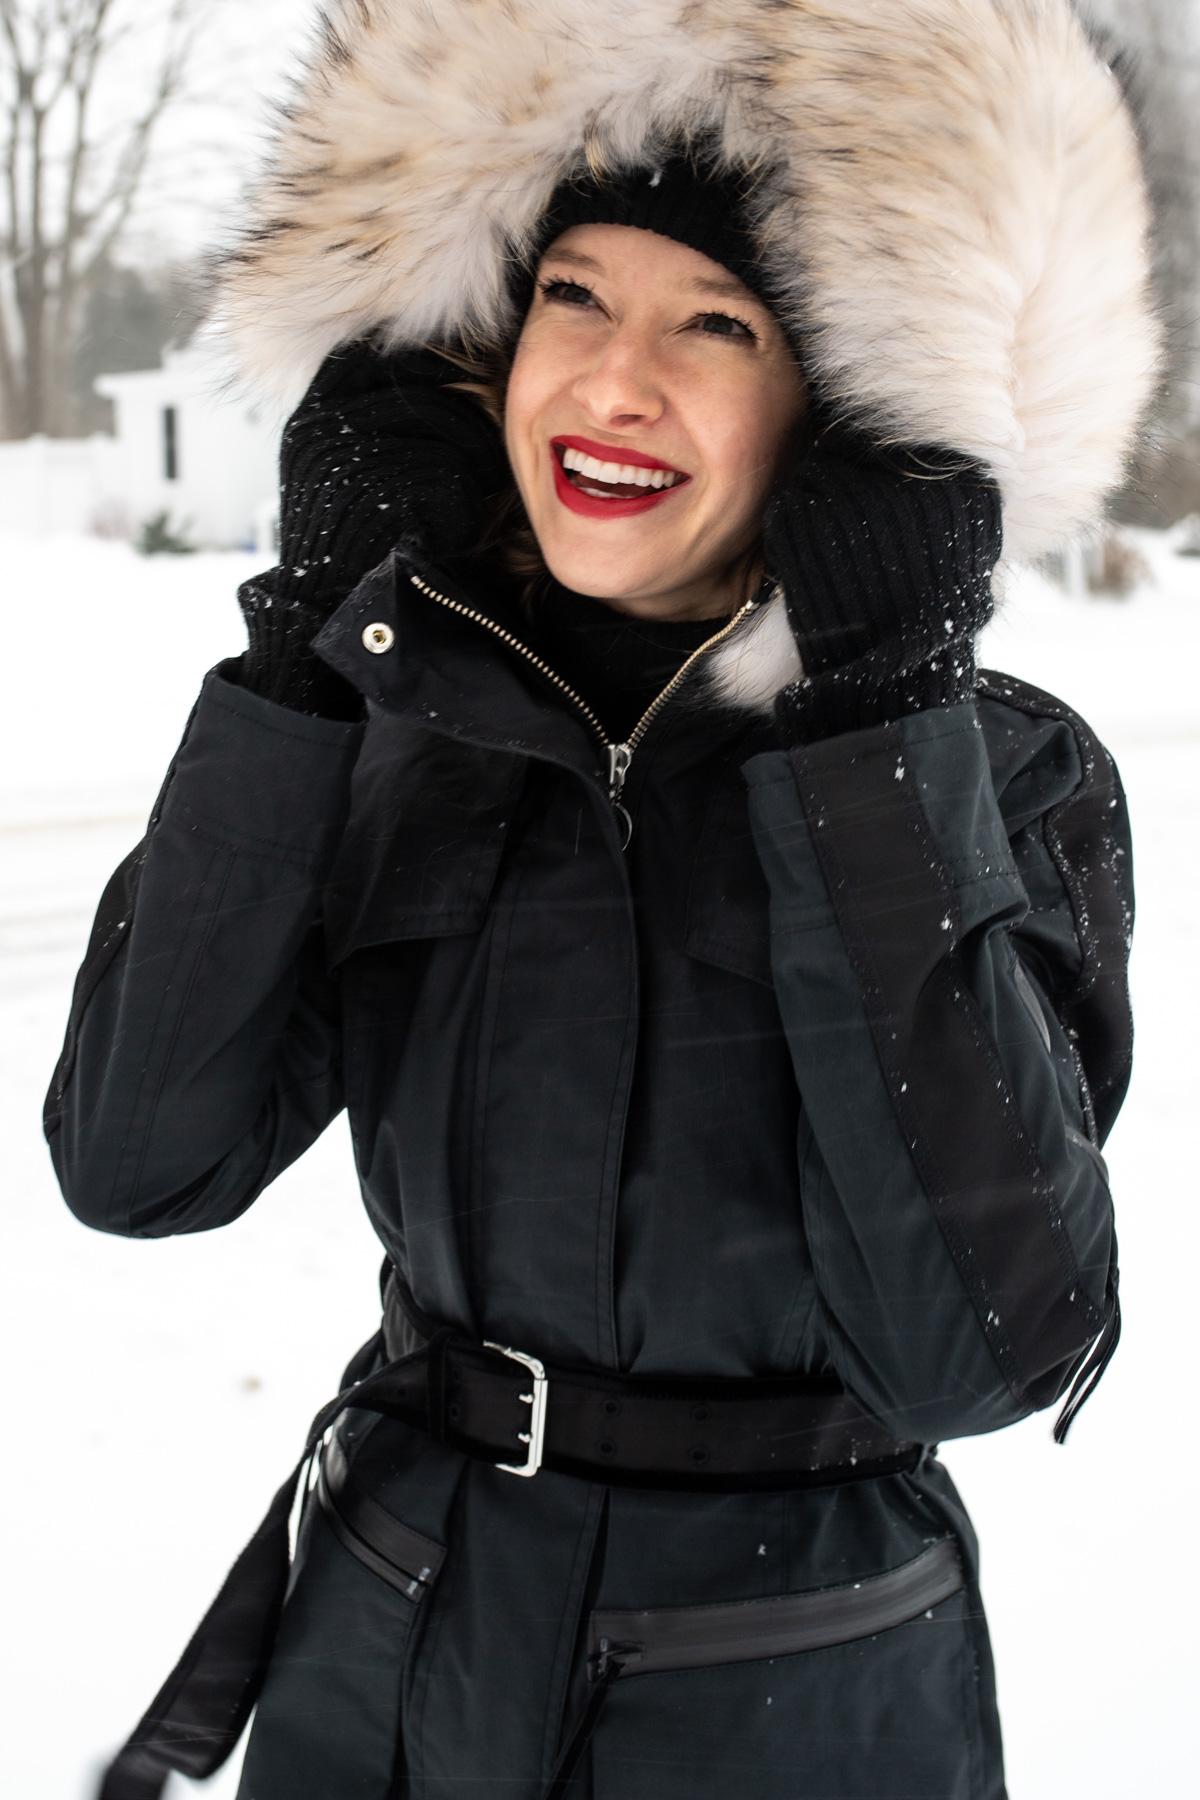 Stacie Flinner x Winter Essentials Troy London Jacket-2.jpg